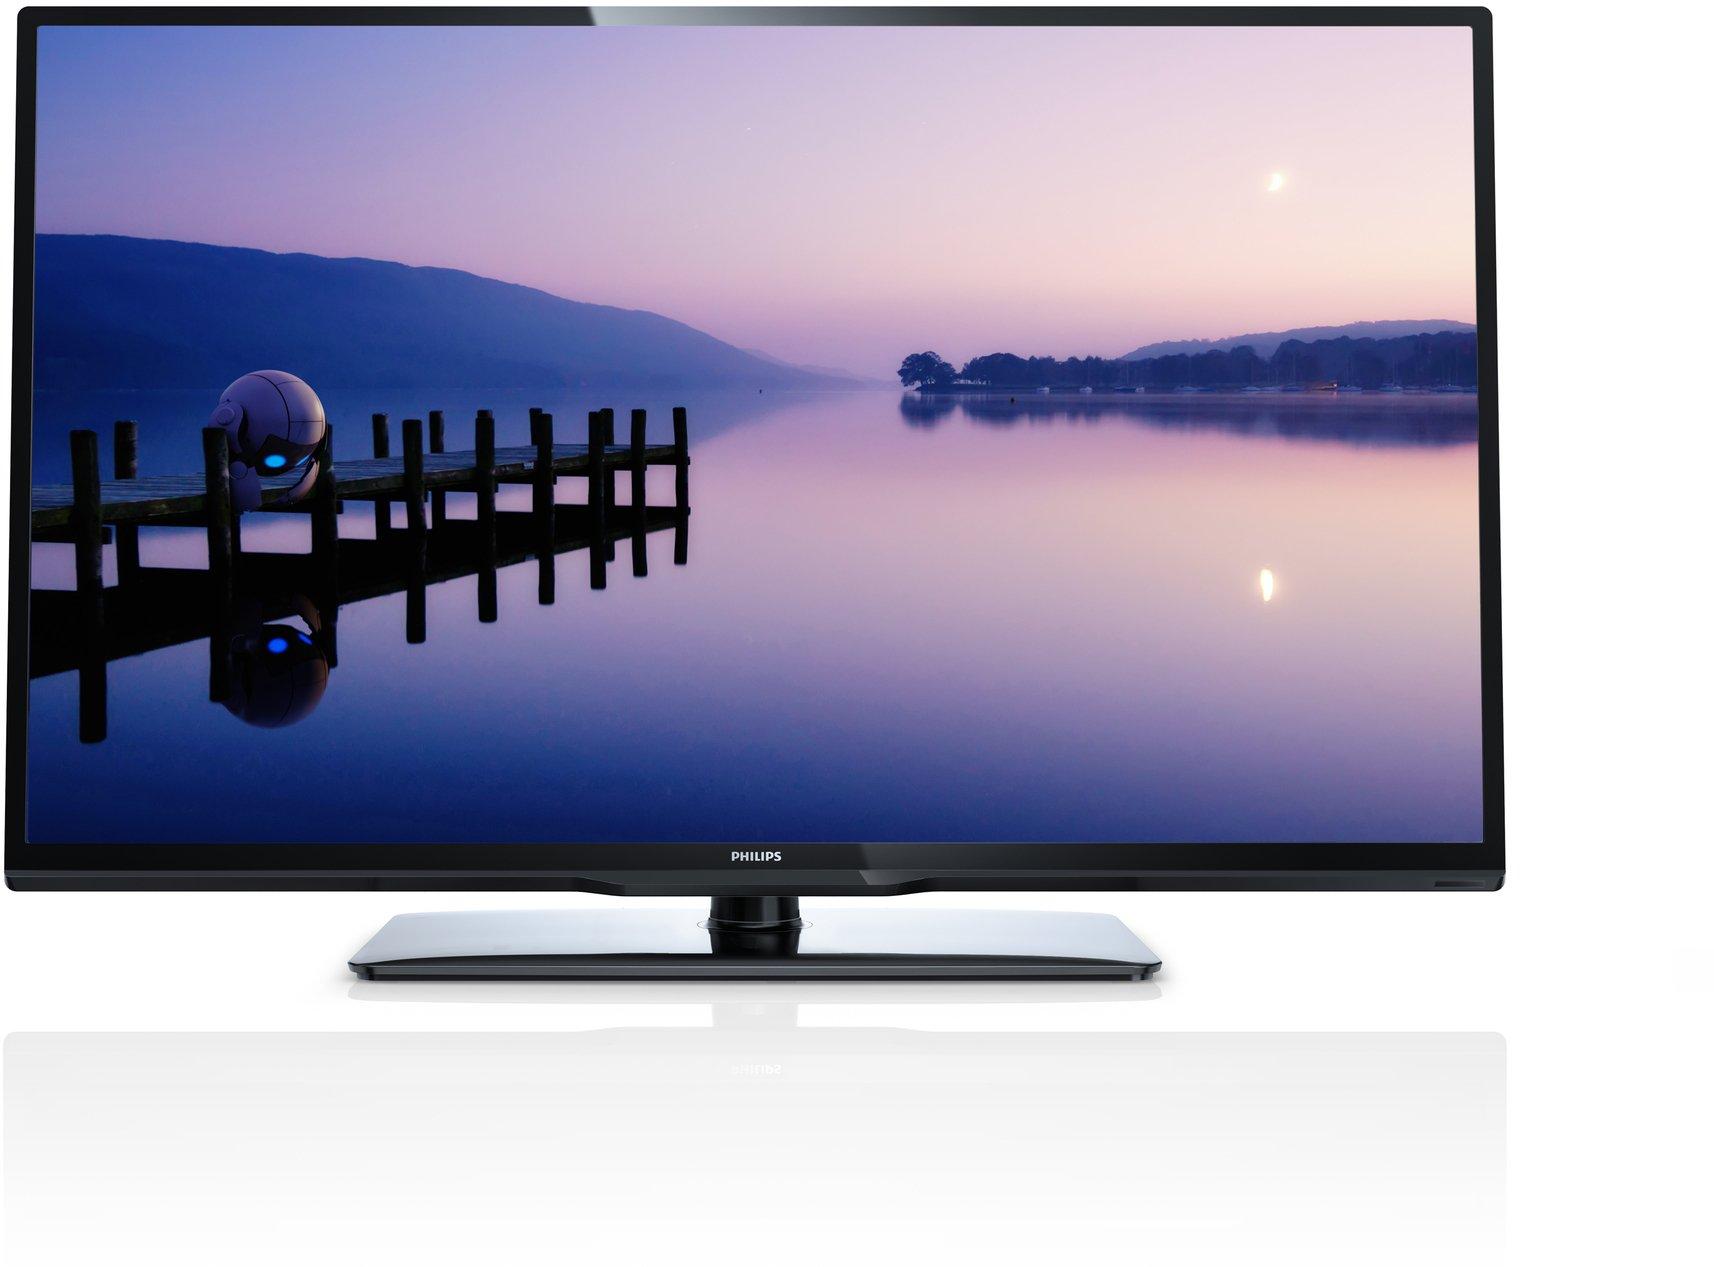 Philips 3000 series TV LED compacto 32PFL3078K: Amazon.es: Electrónica